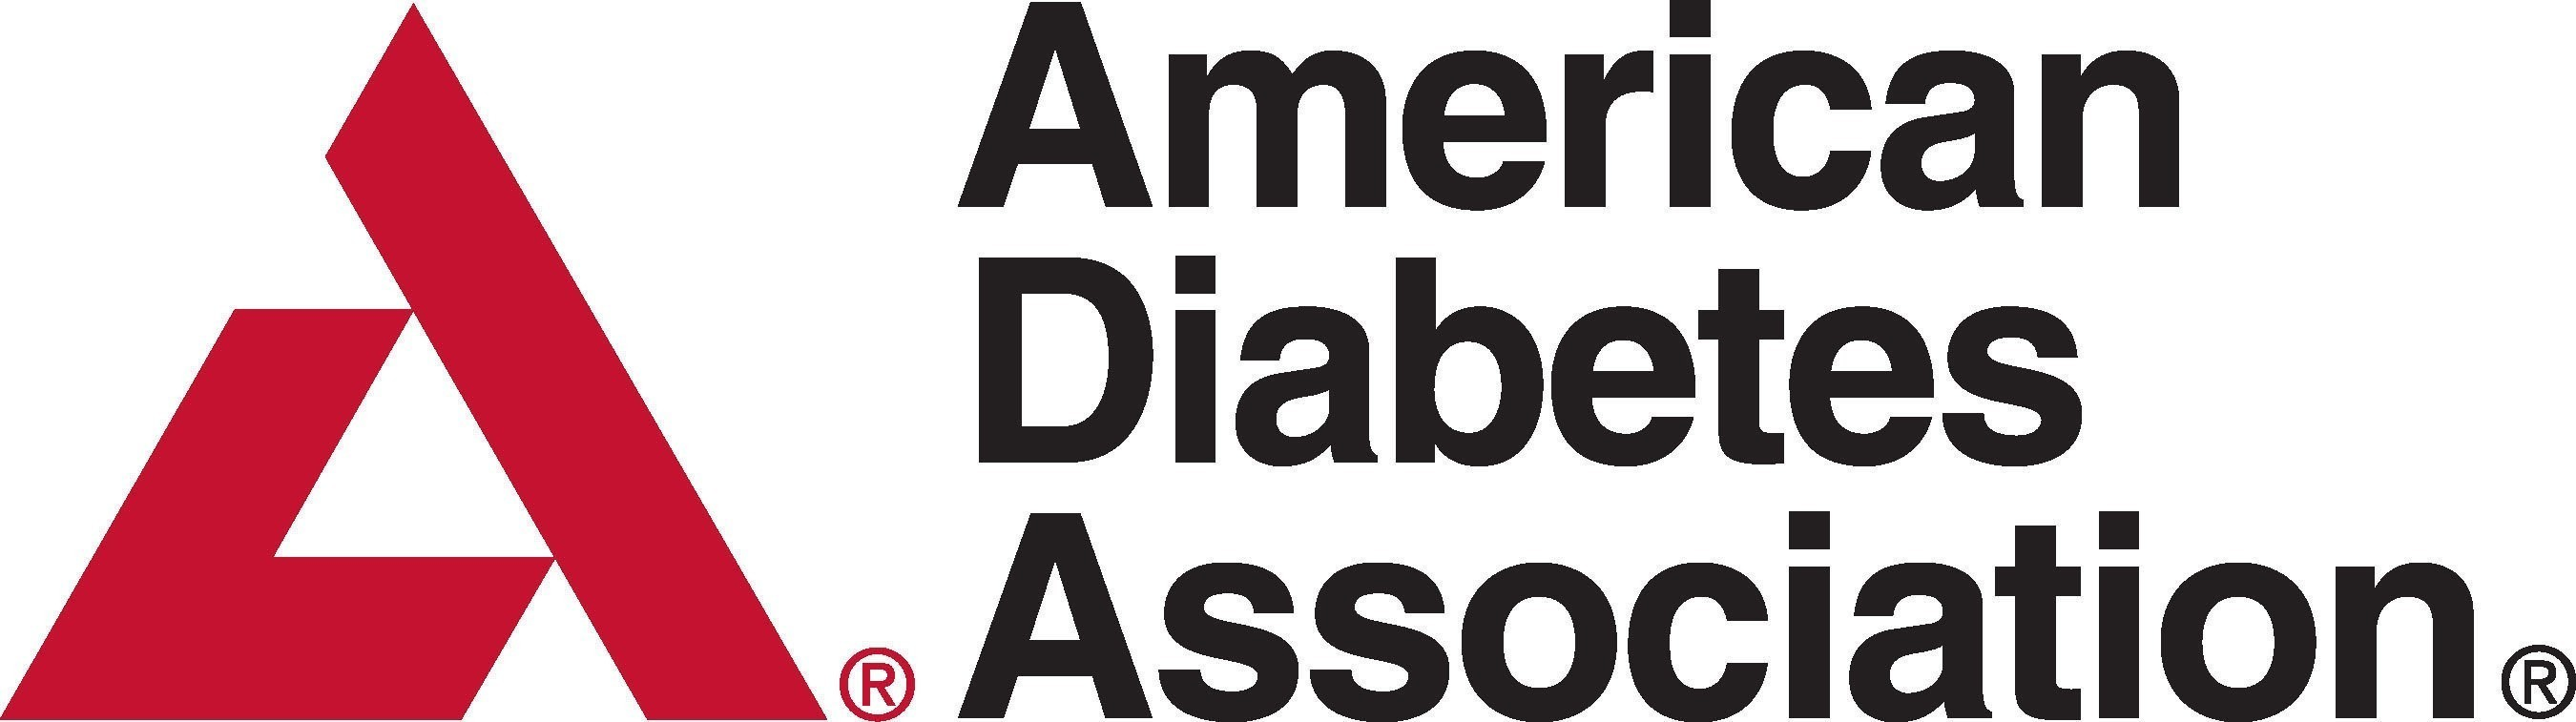 American Diabetes Association Logo.